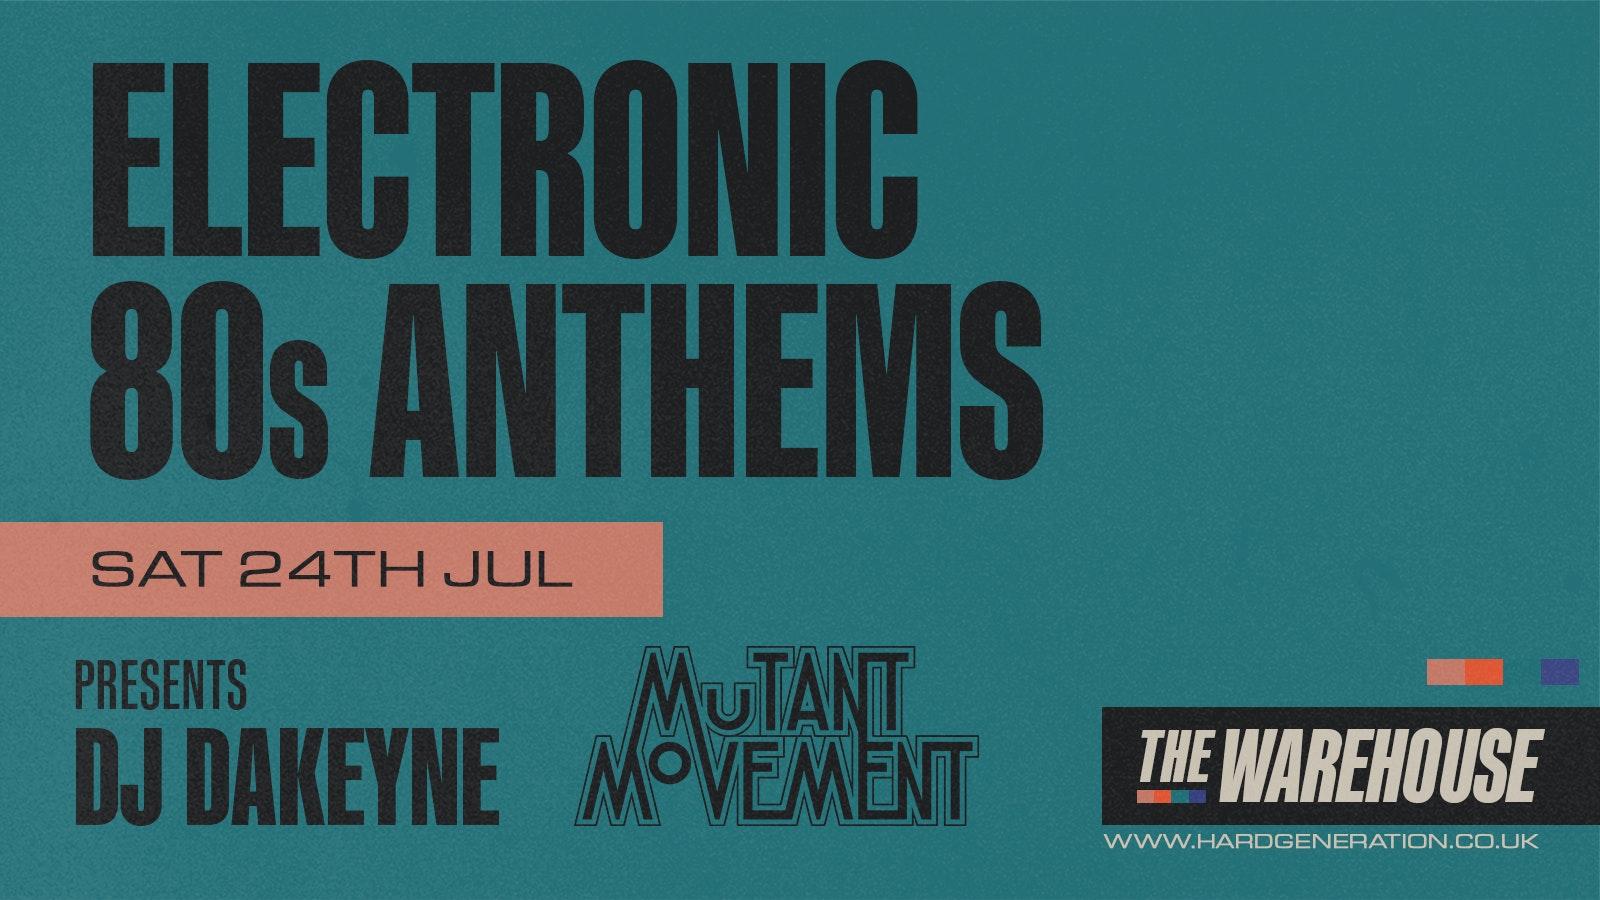 Electronic 80s Anthems: DJ Dakeyne/ Mutant Movement – Club